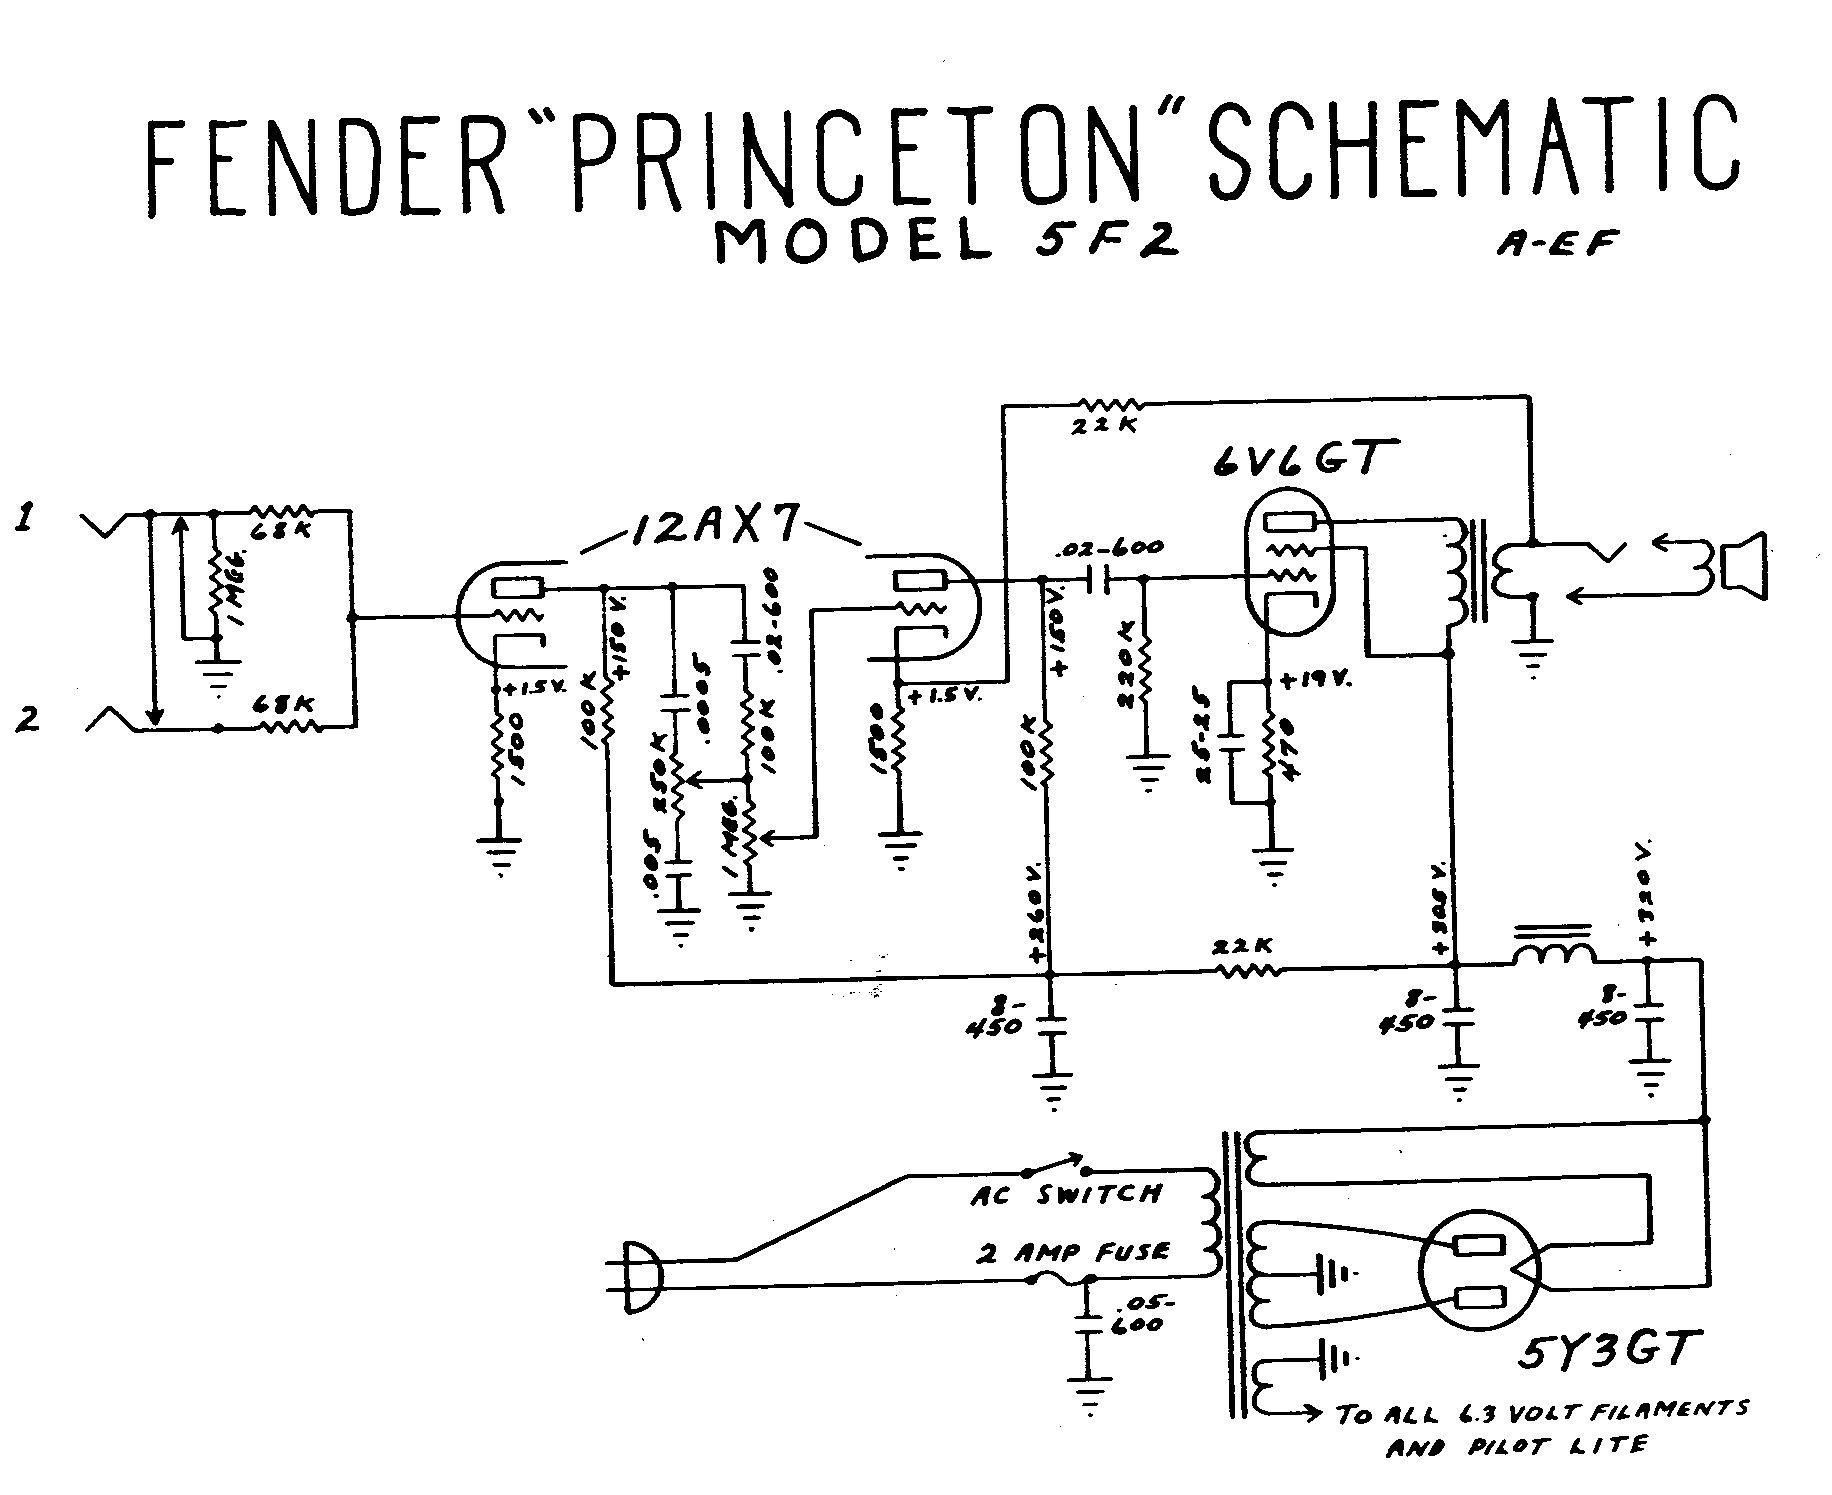 princeton fender amp footswitch wiring diagrams wiring diagram rh asq rundumhund aktiv de fender princeton reverb wiring diagram fender princeton reverb wiring diagram